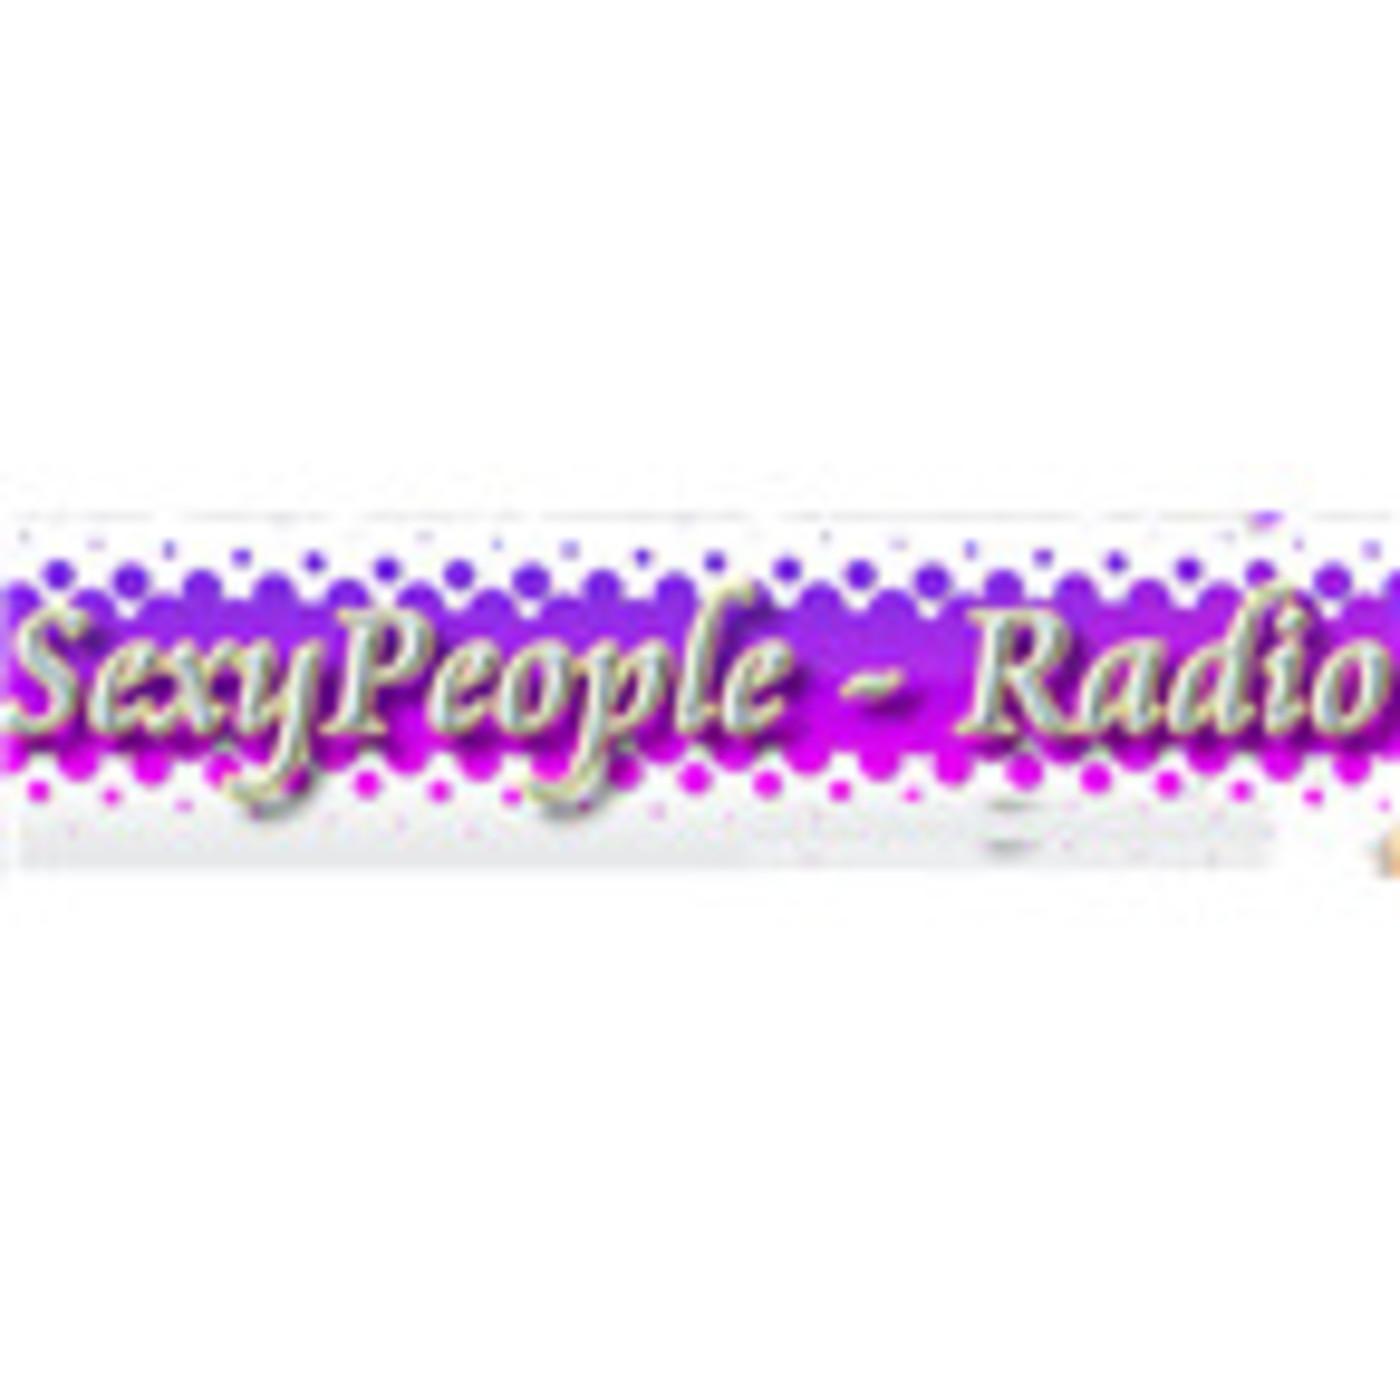 Sexy People Radio